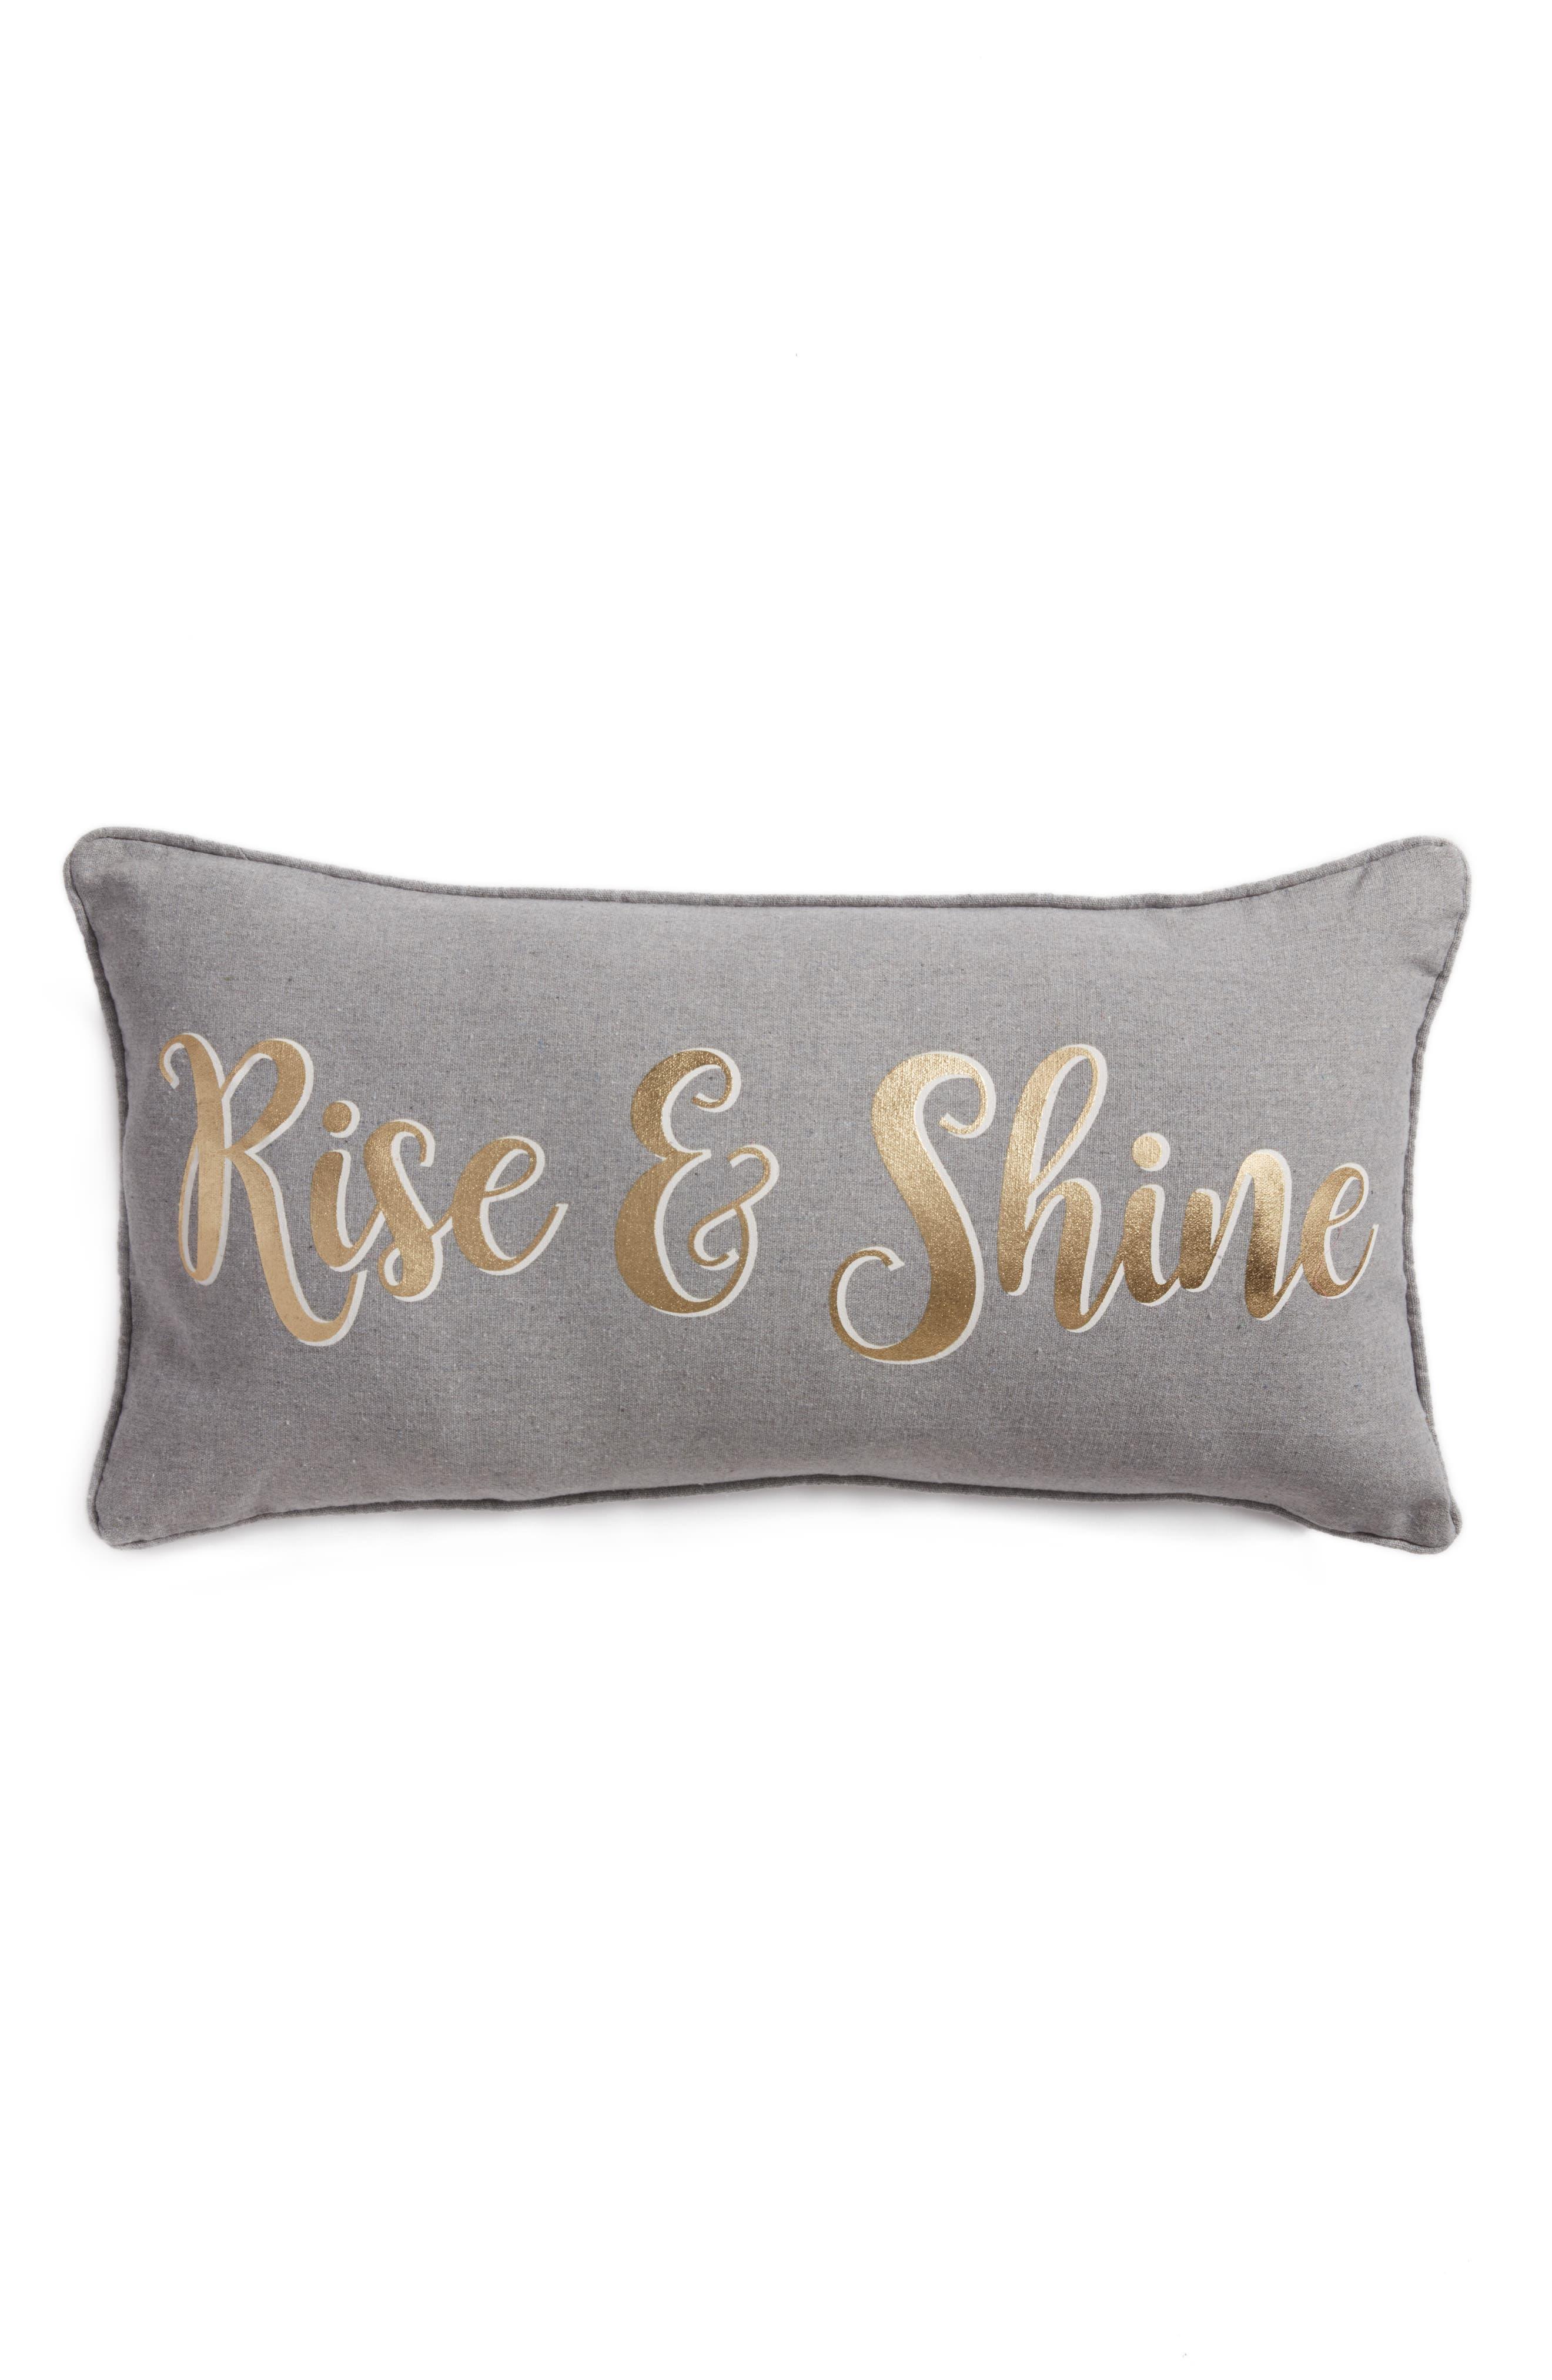 Arden Rise & Shine Accent Pillow,                         Main,                         color, Grey